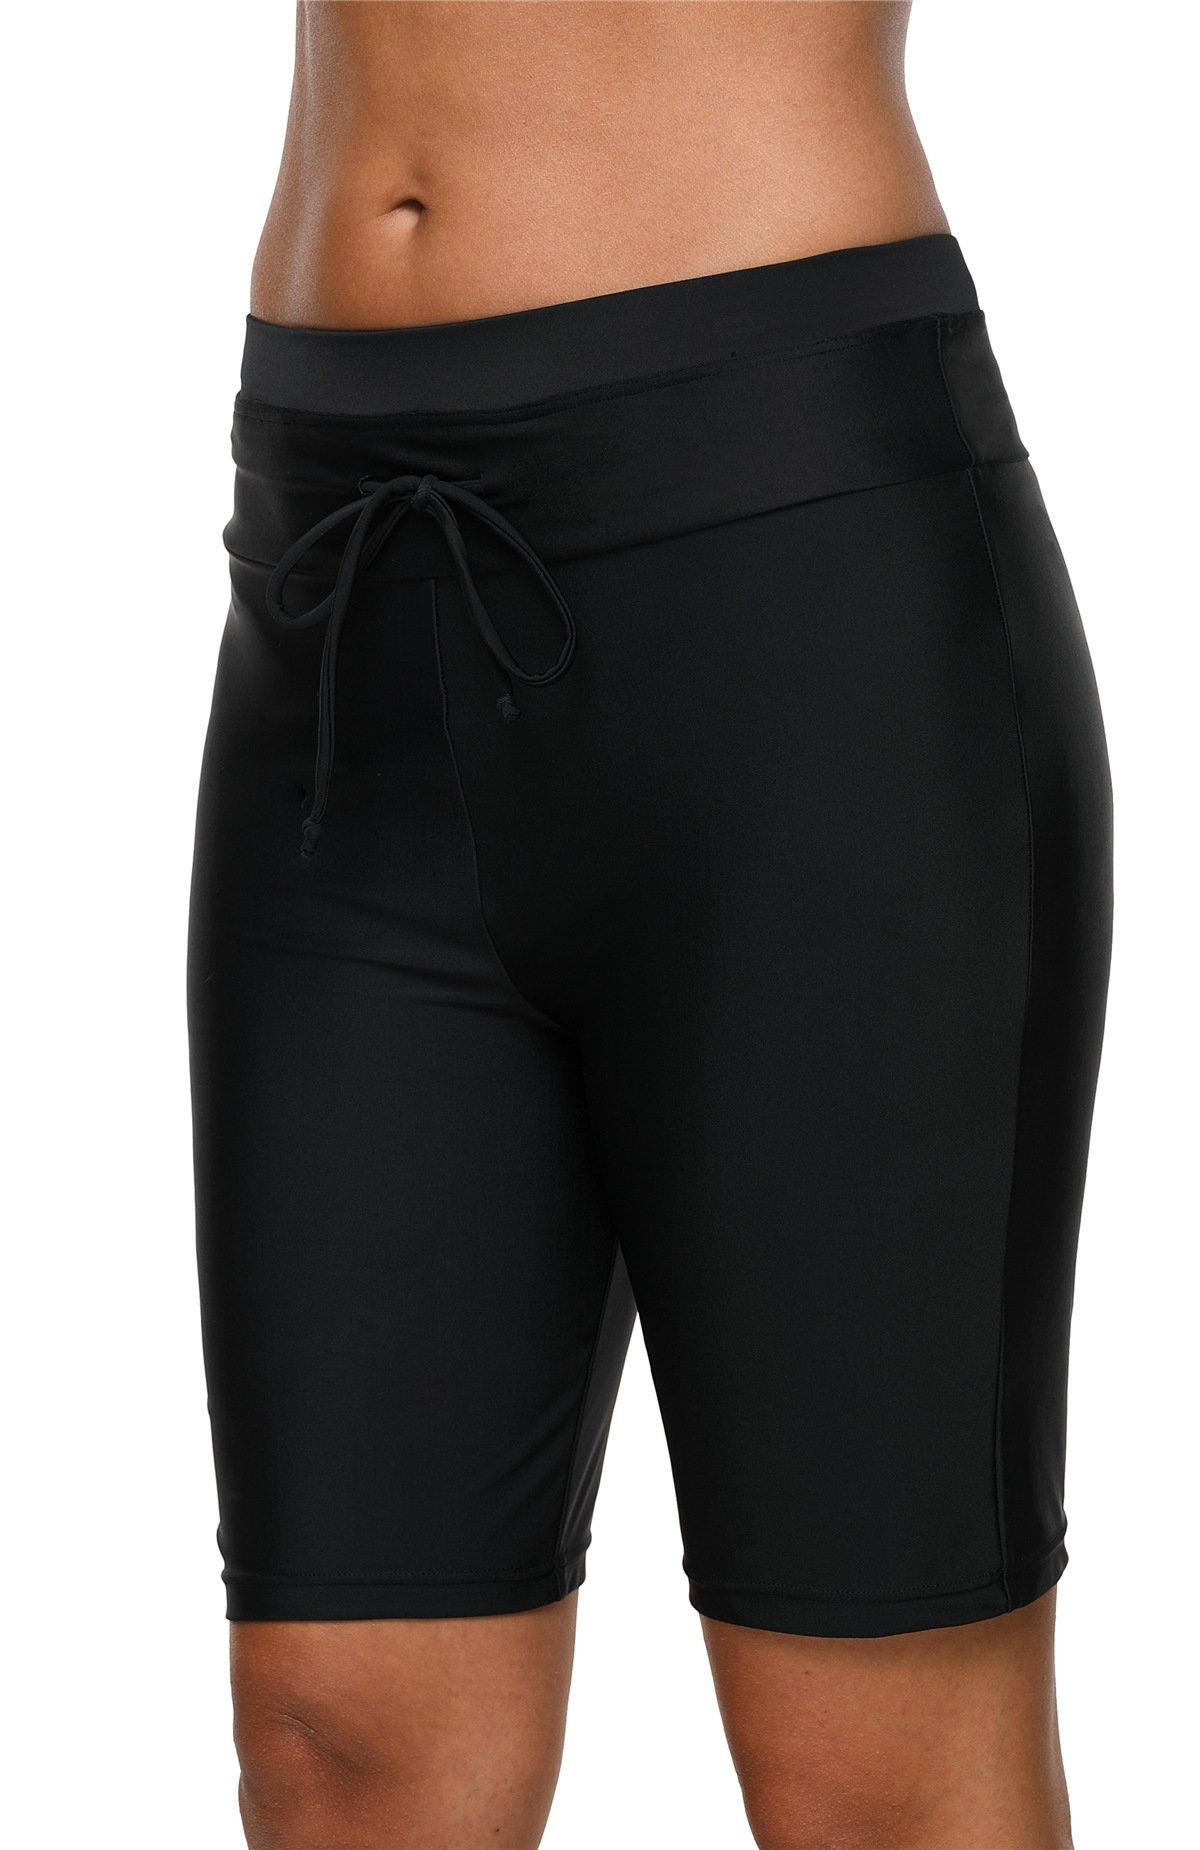 beautyin Women Waistband Tankini Swim Shorts Solid Boardshort Swimsuit Bottom XL